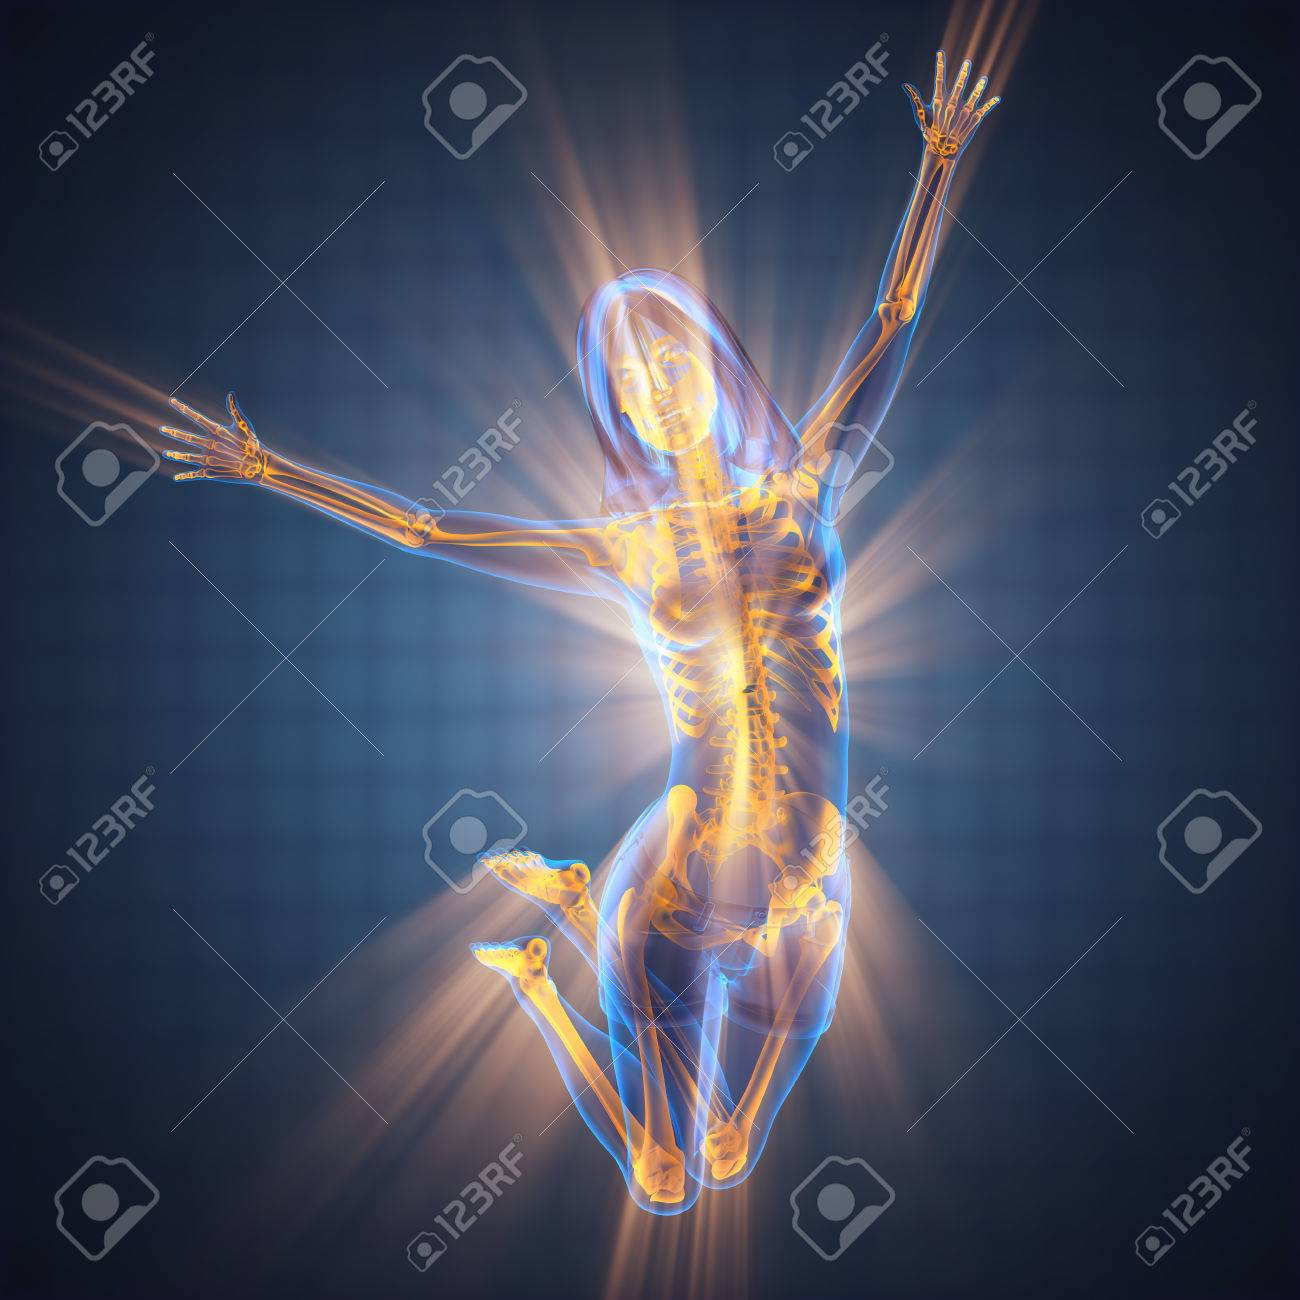 woman bones radiography scan image Stock Photo - 47966437